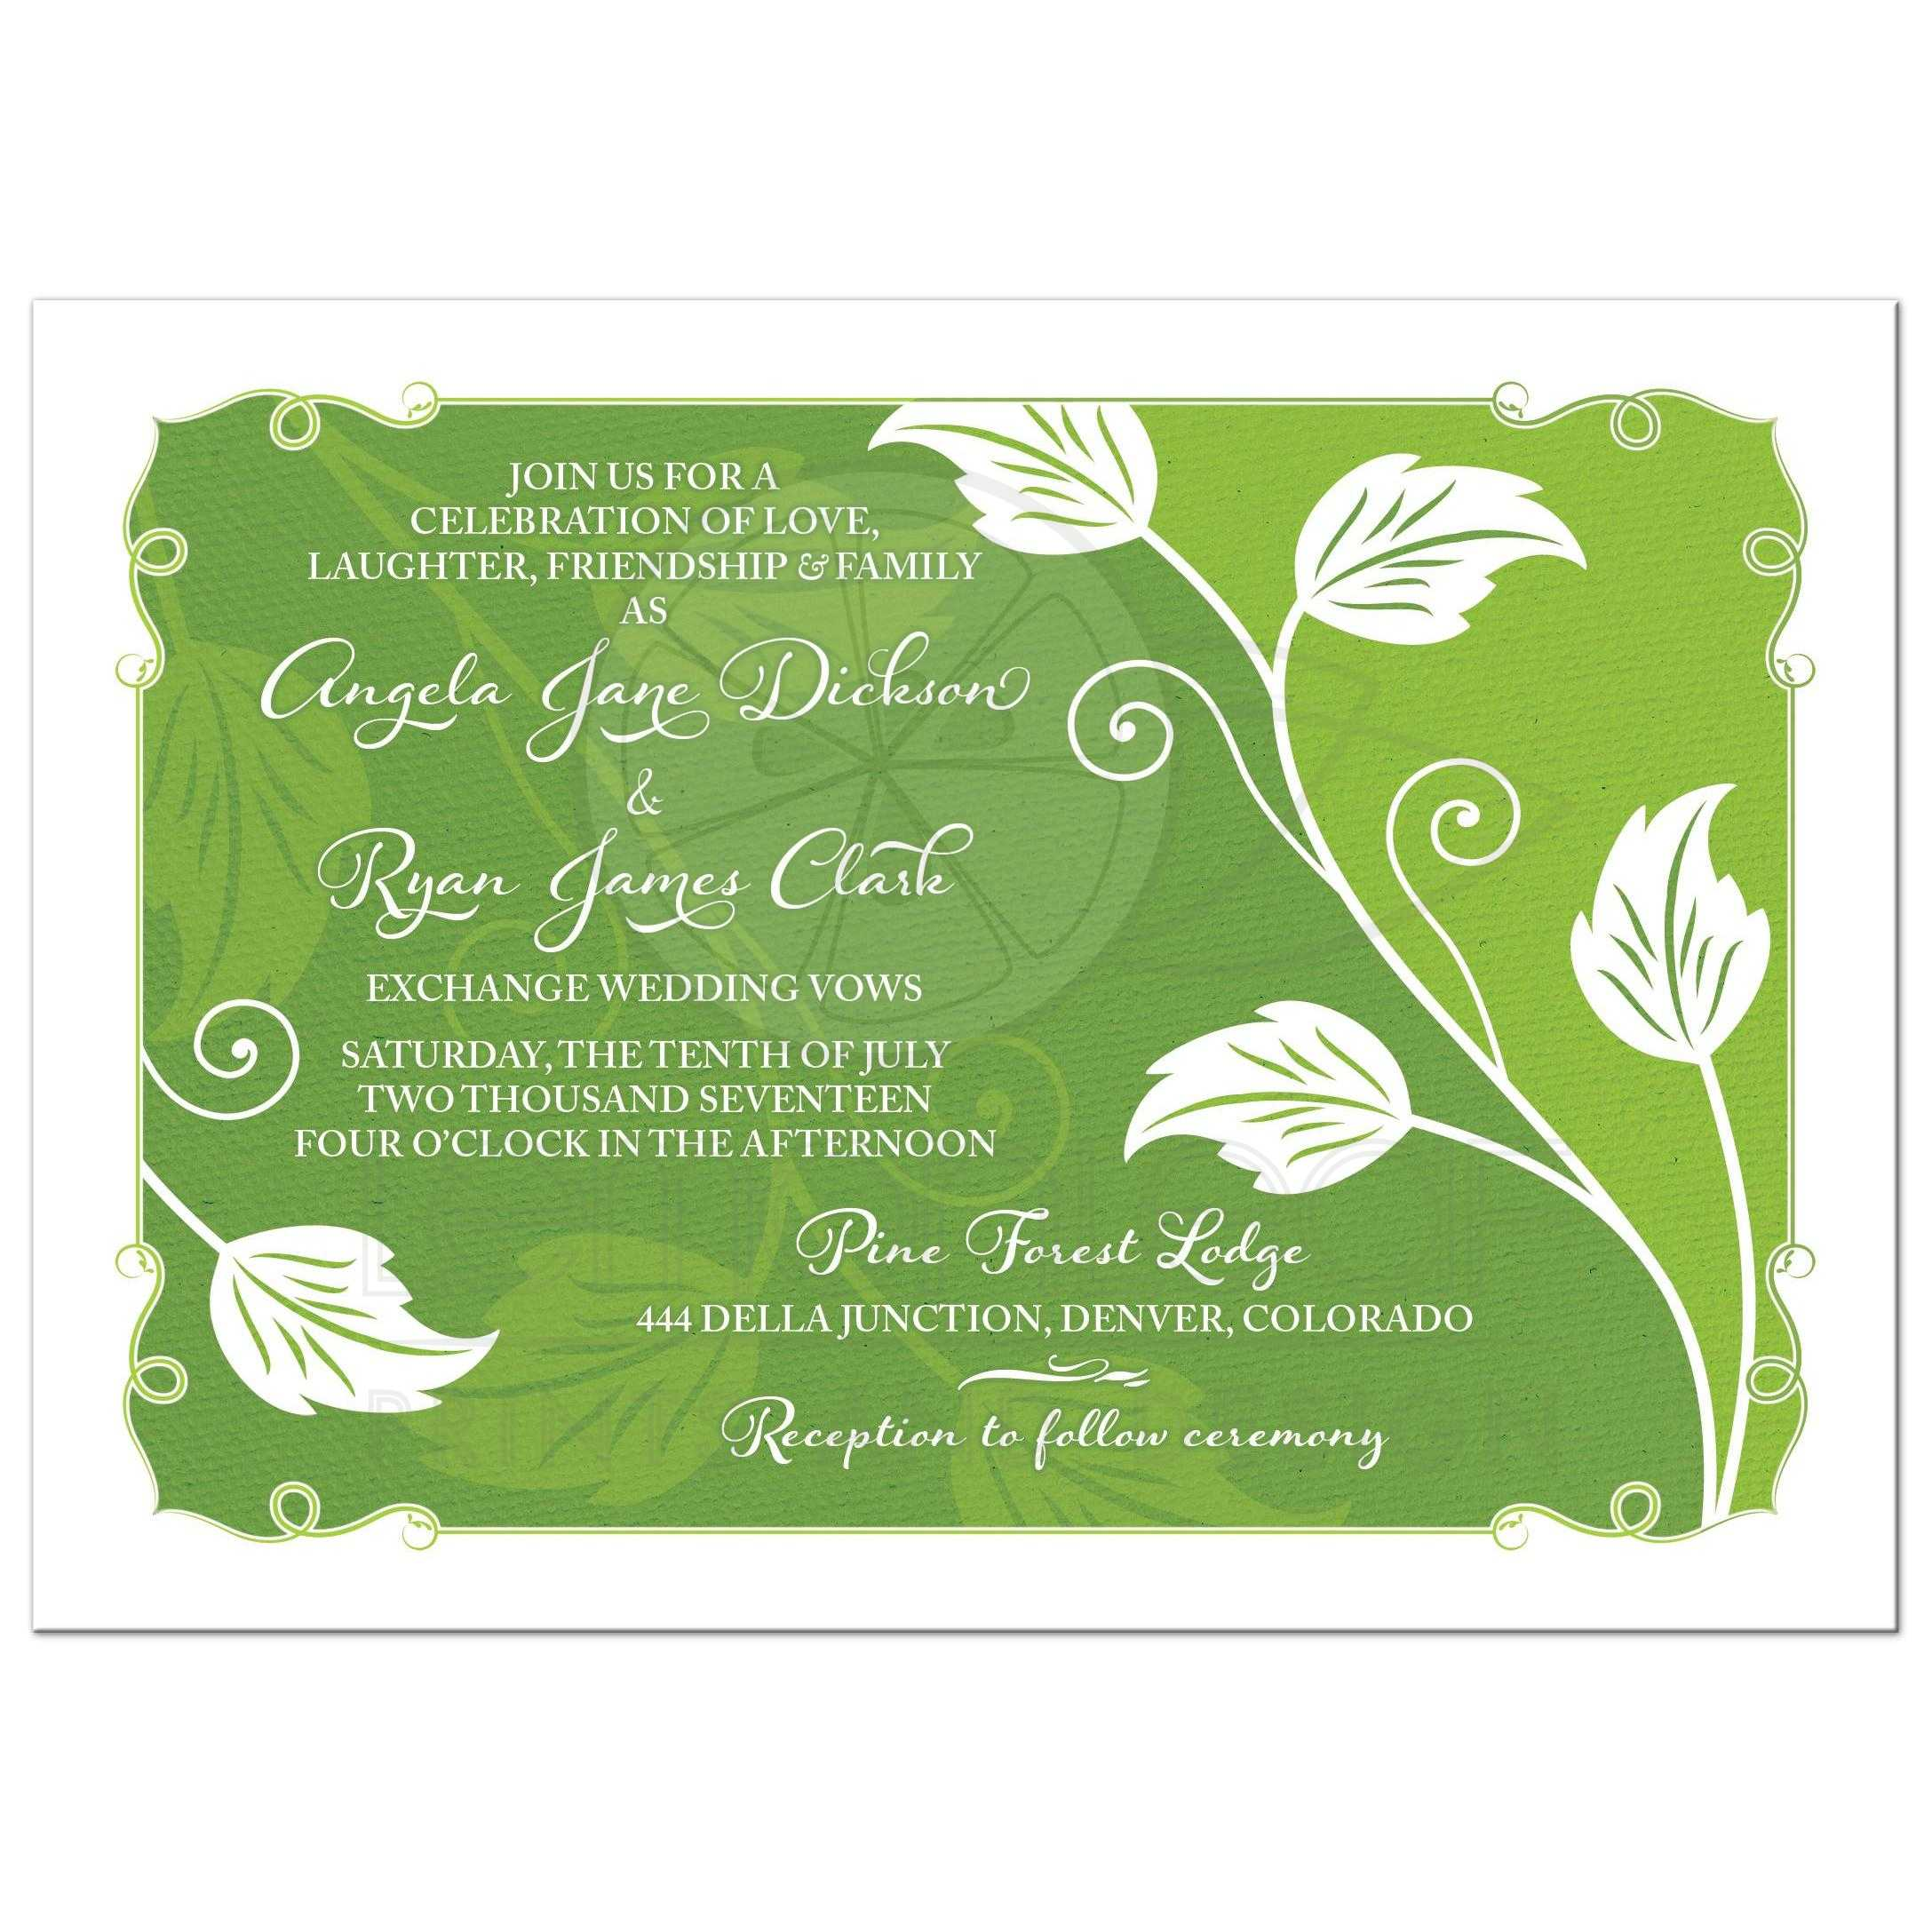 Greenery Wedding Invitation Green Leafy Vine Leaves